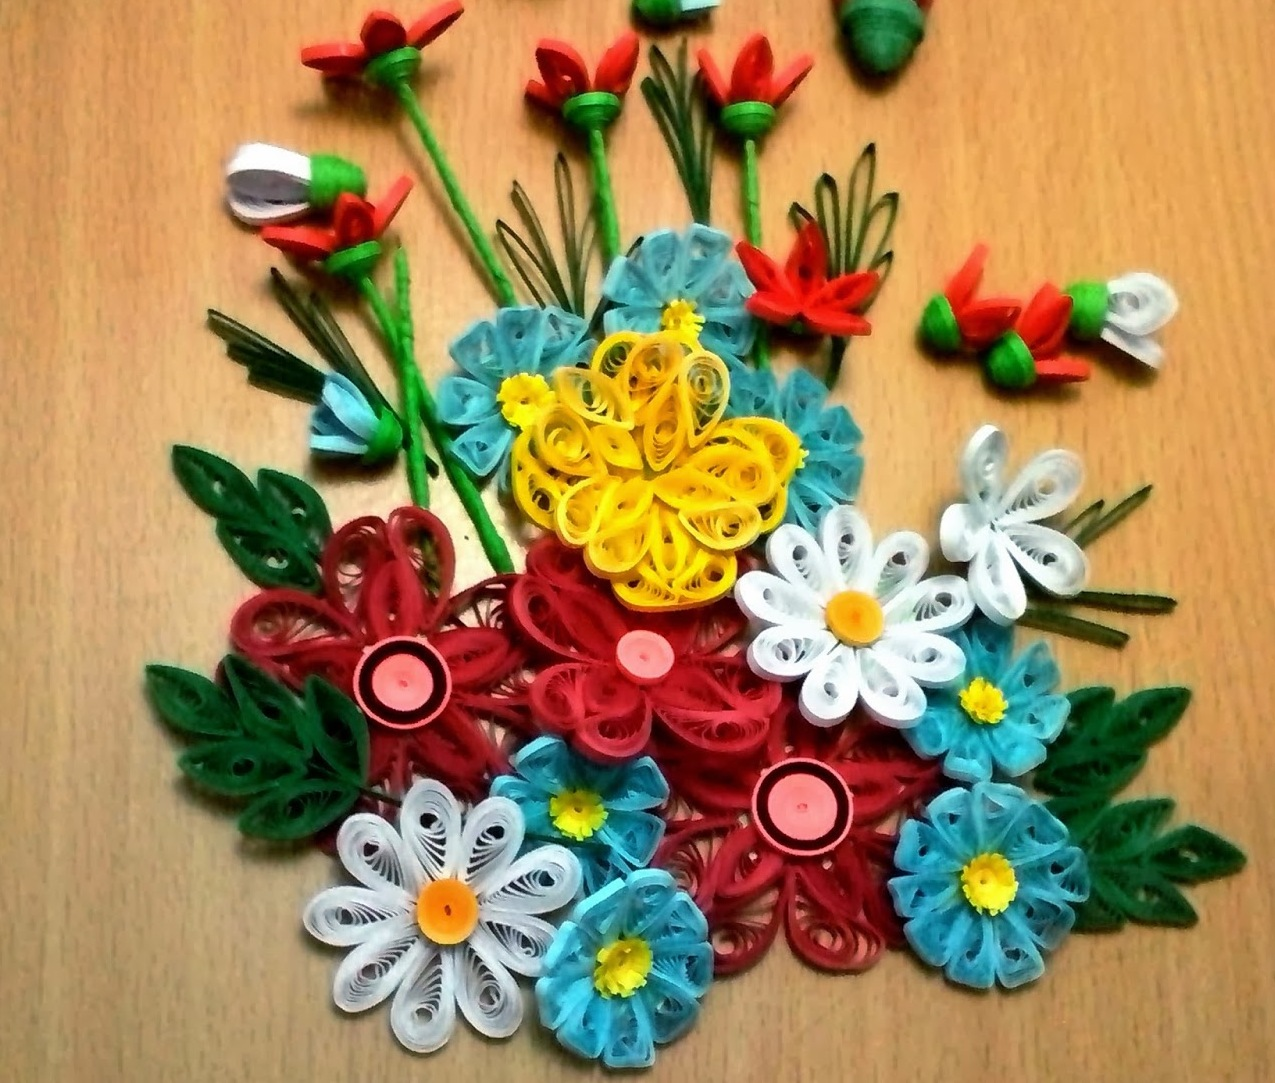 Gubahan Bunga Hiasan Dinding Desainrumahid com